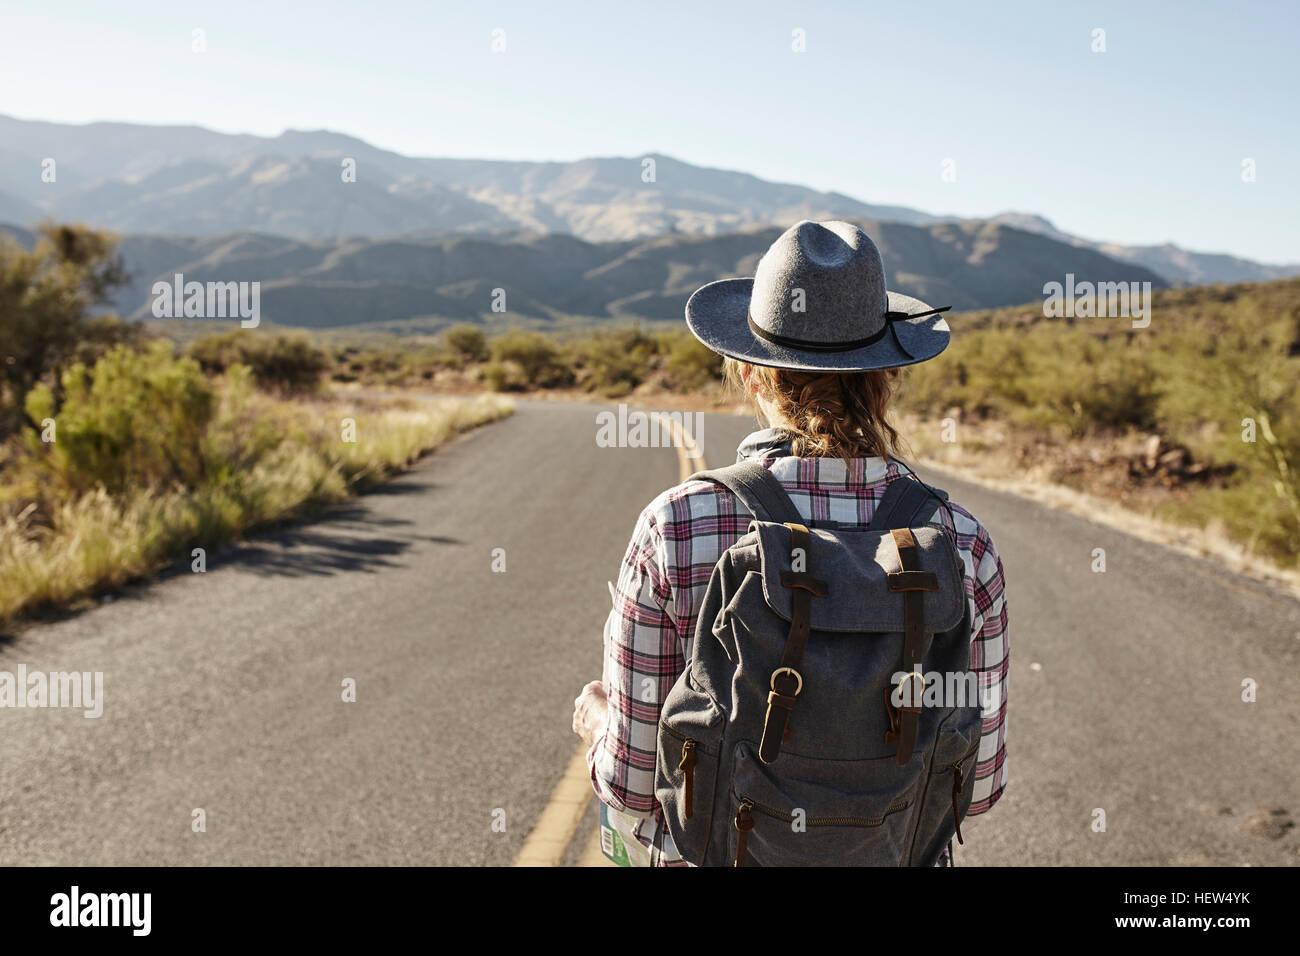 Woman standing in desert road, looking ahead, Sedona, Arizona, USA - Stock Image